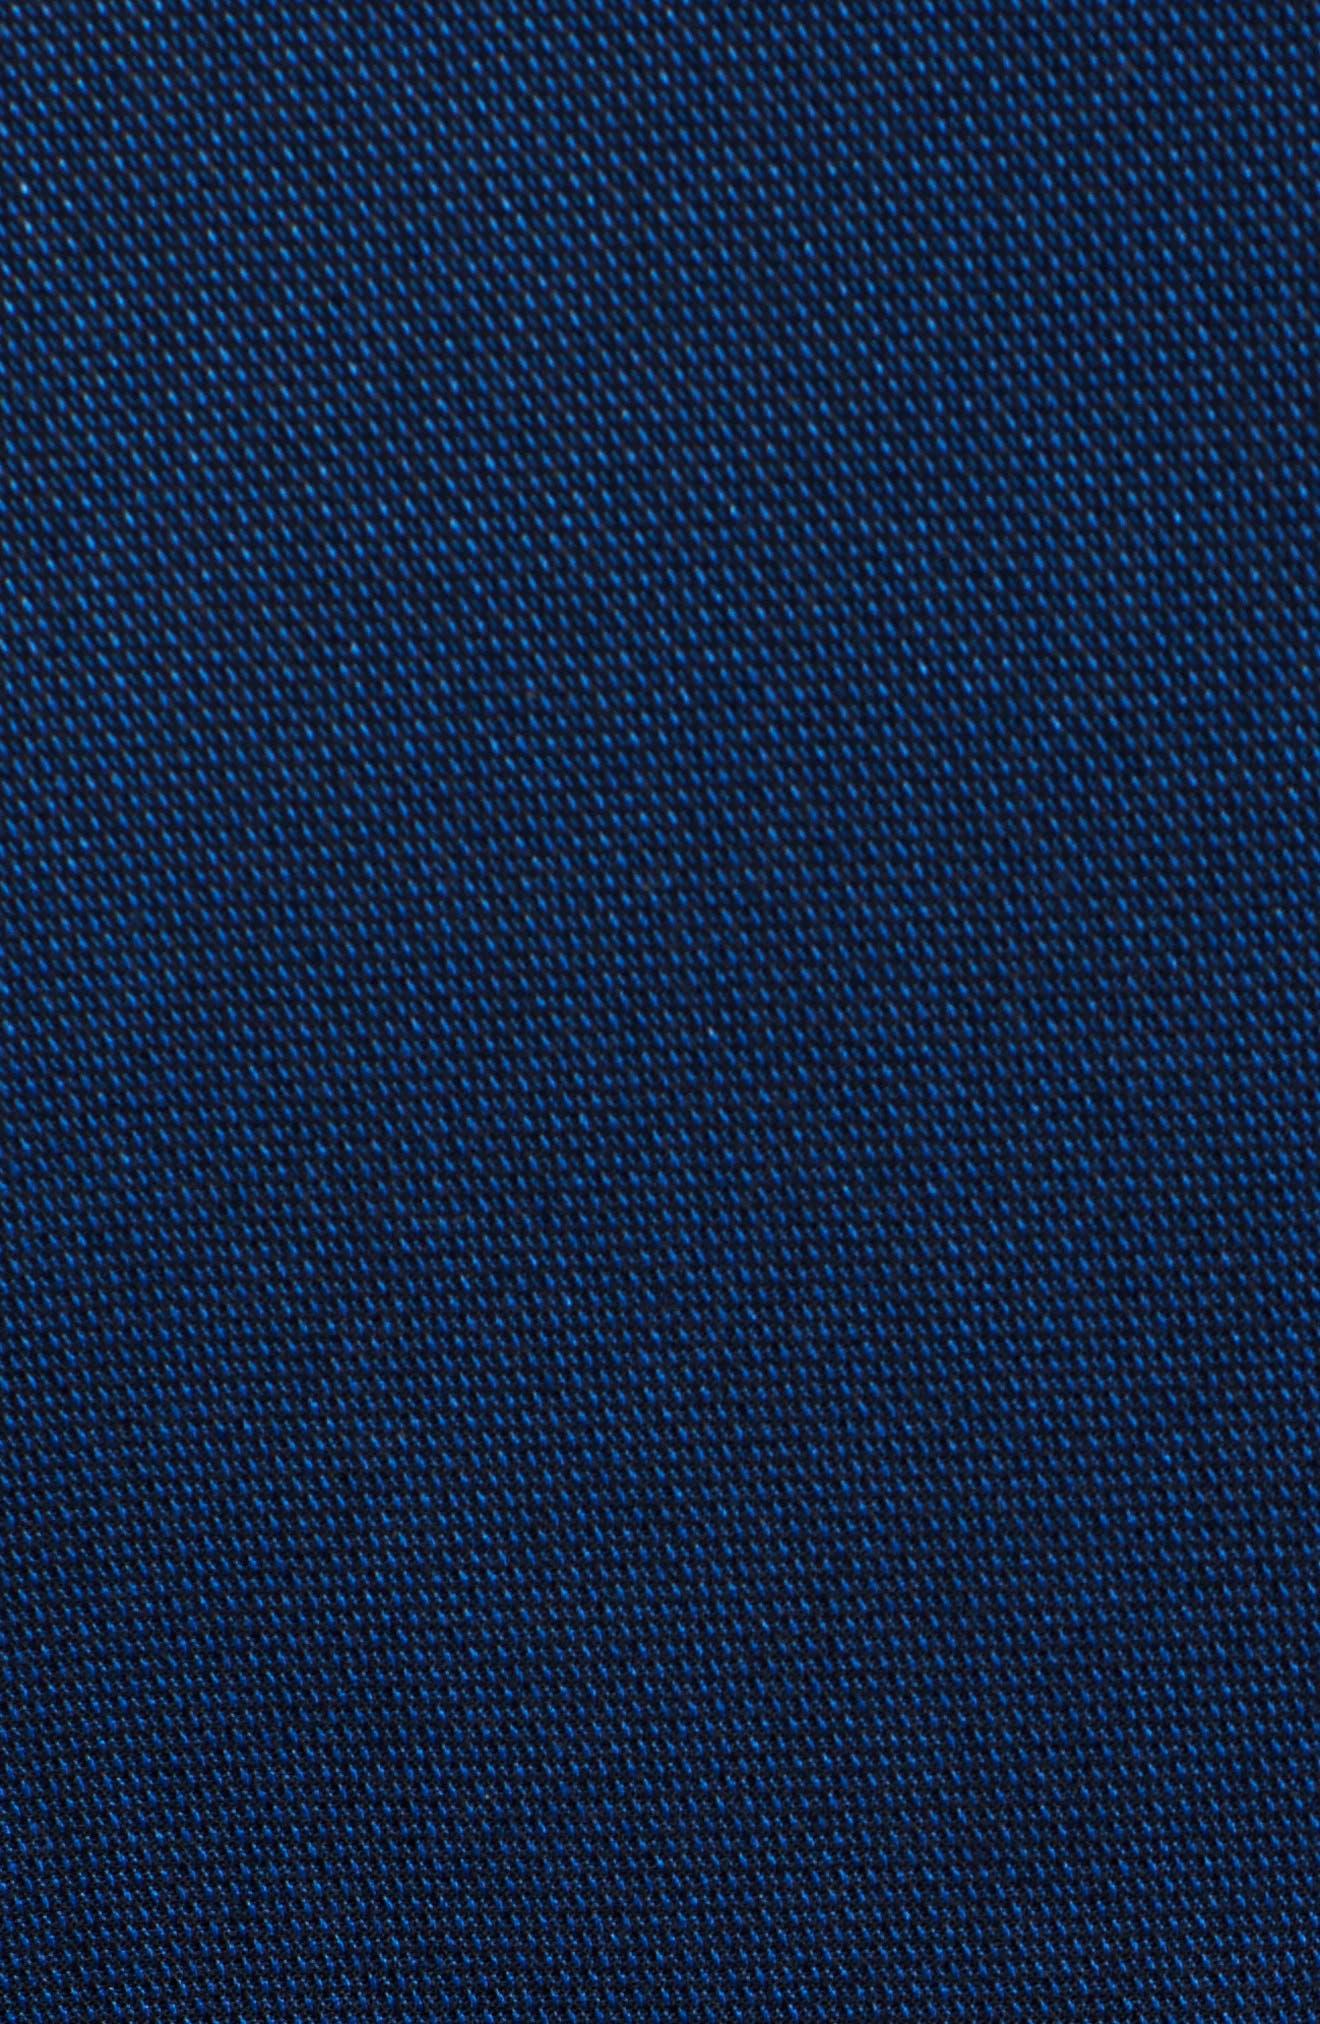 Skinny Fit Suit Jacket,                             Alternate thumbnail 6, color,                             BLUE